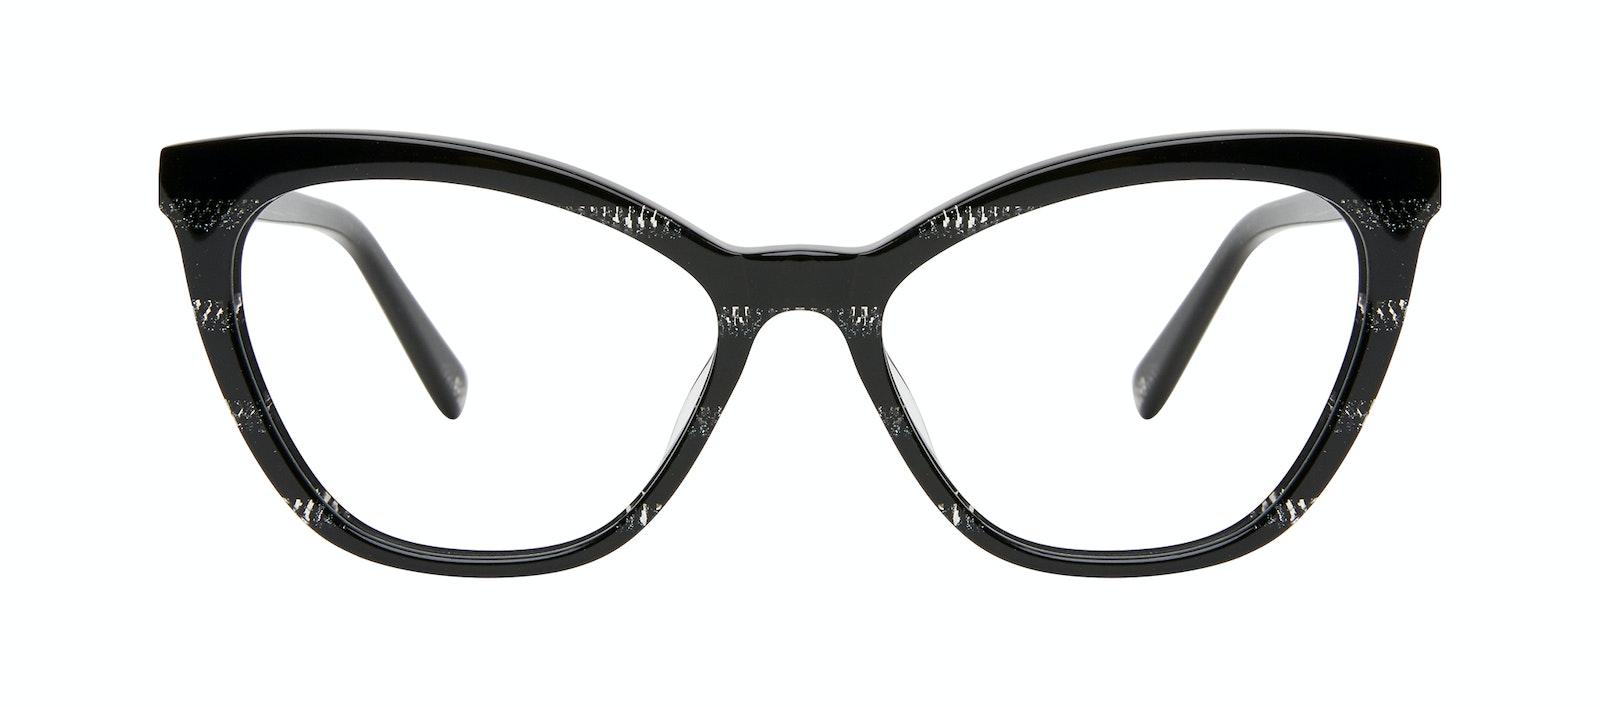 Affordable Fashion Glasses Cat Eye Eyeglasses Women Elan Night Front